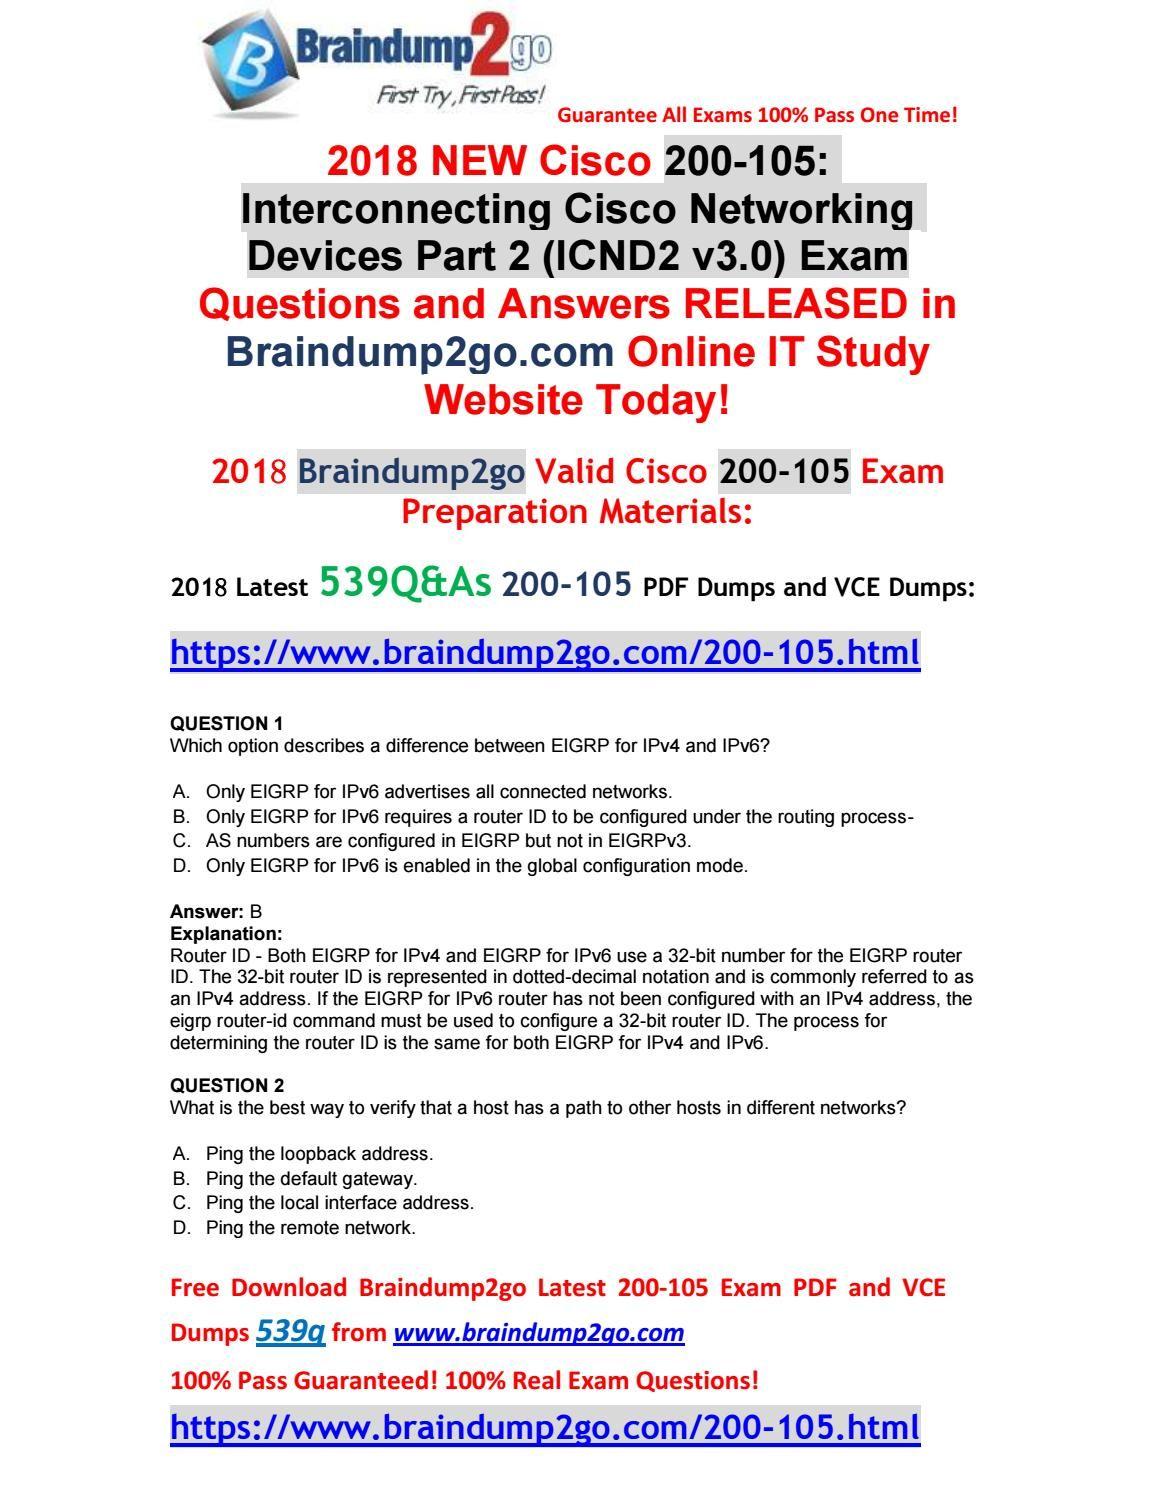 2018-7-Version] New Braindump2go 200-105PDF and VCE Dumps 539Q Free